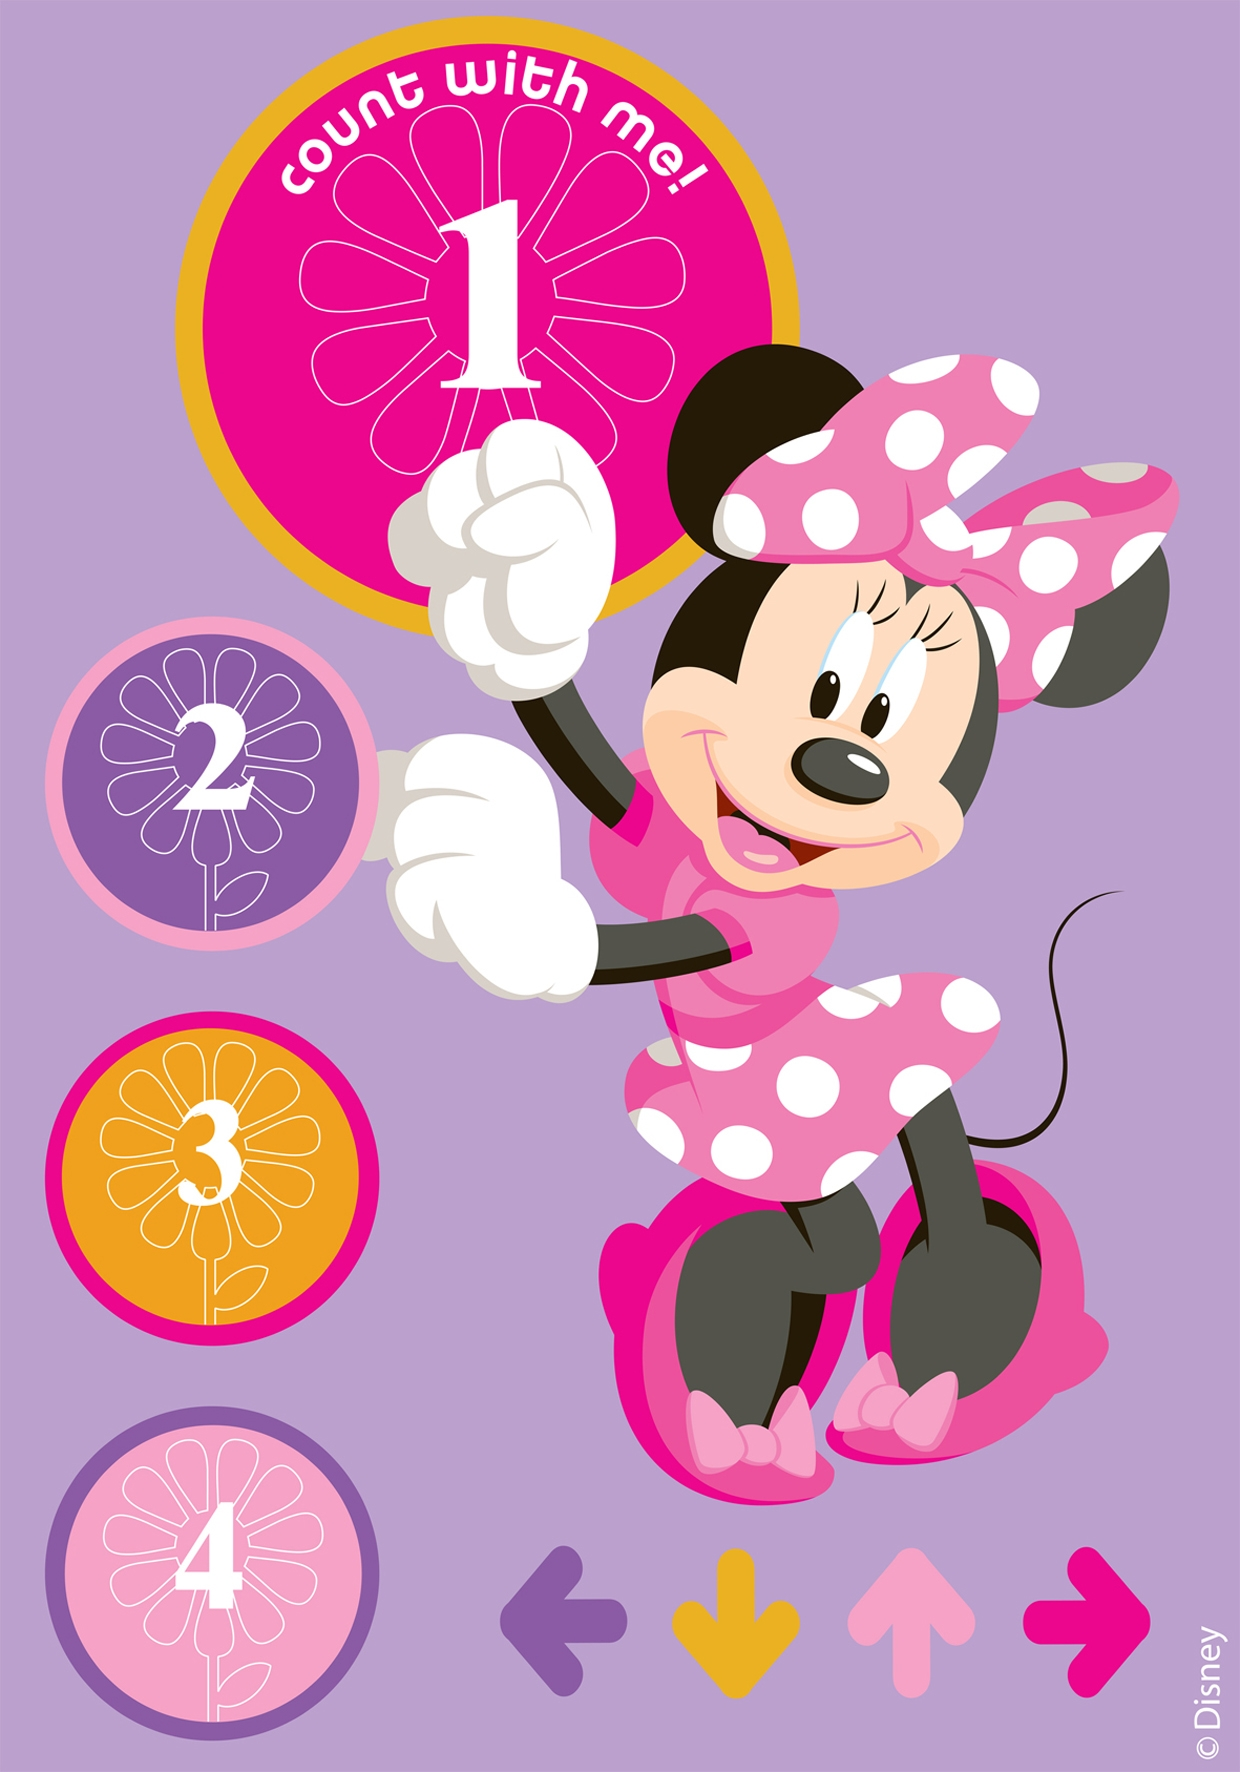 Covor Disney Kids Minnie Right / Left Imprimat Digital-133 x 190 cm